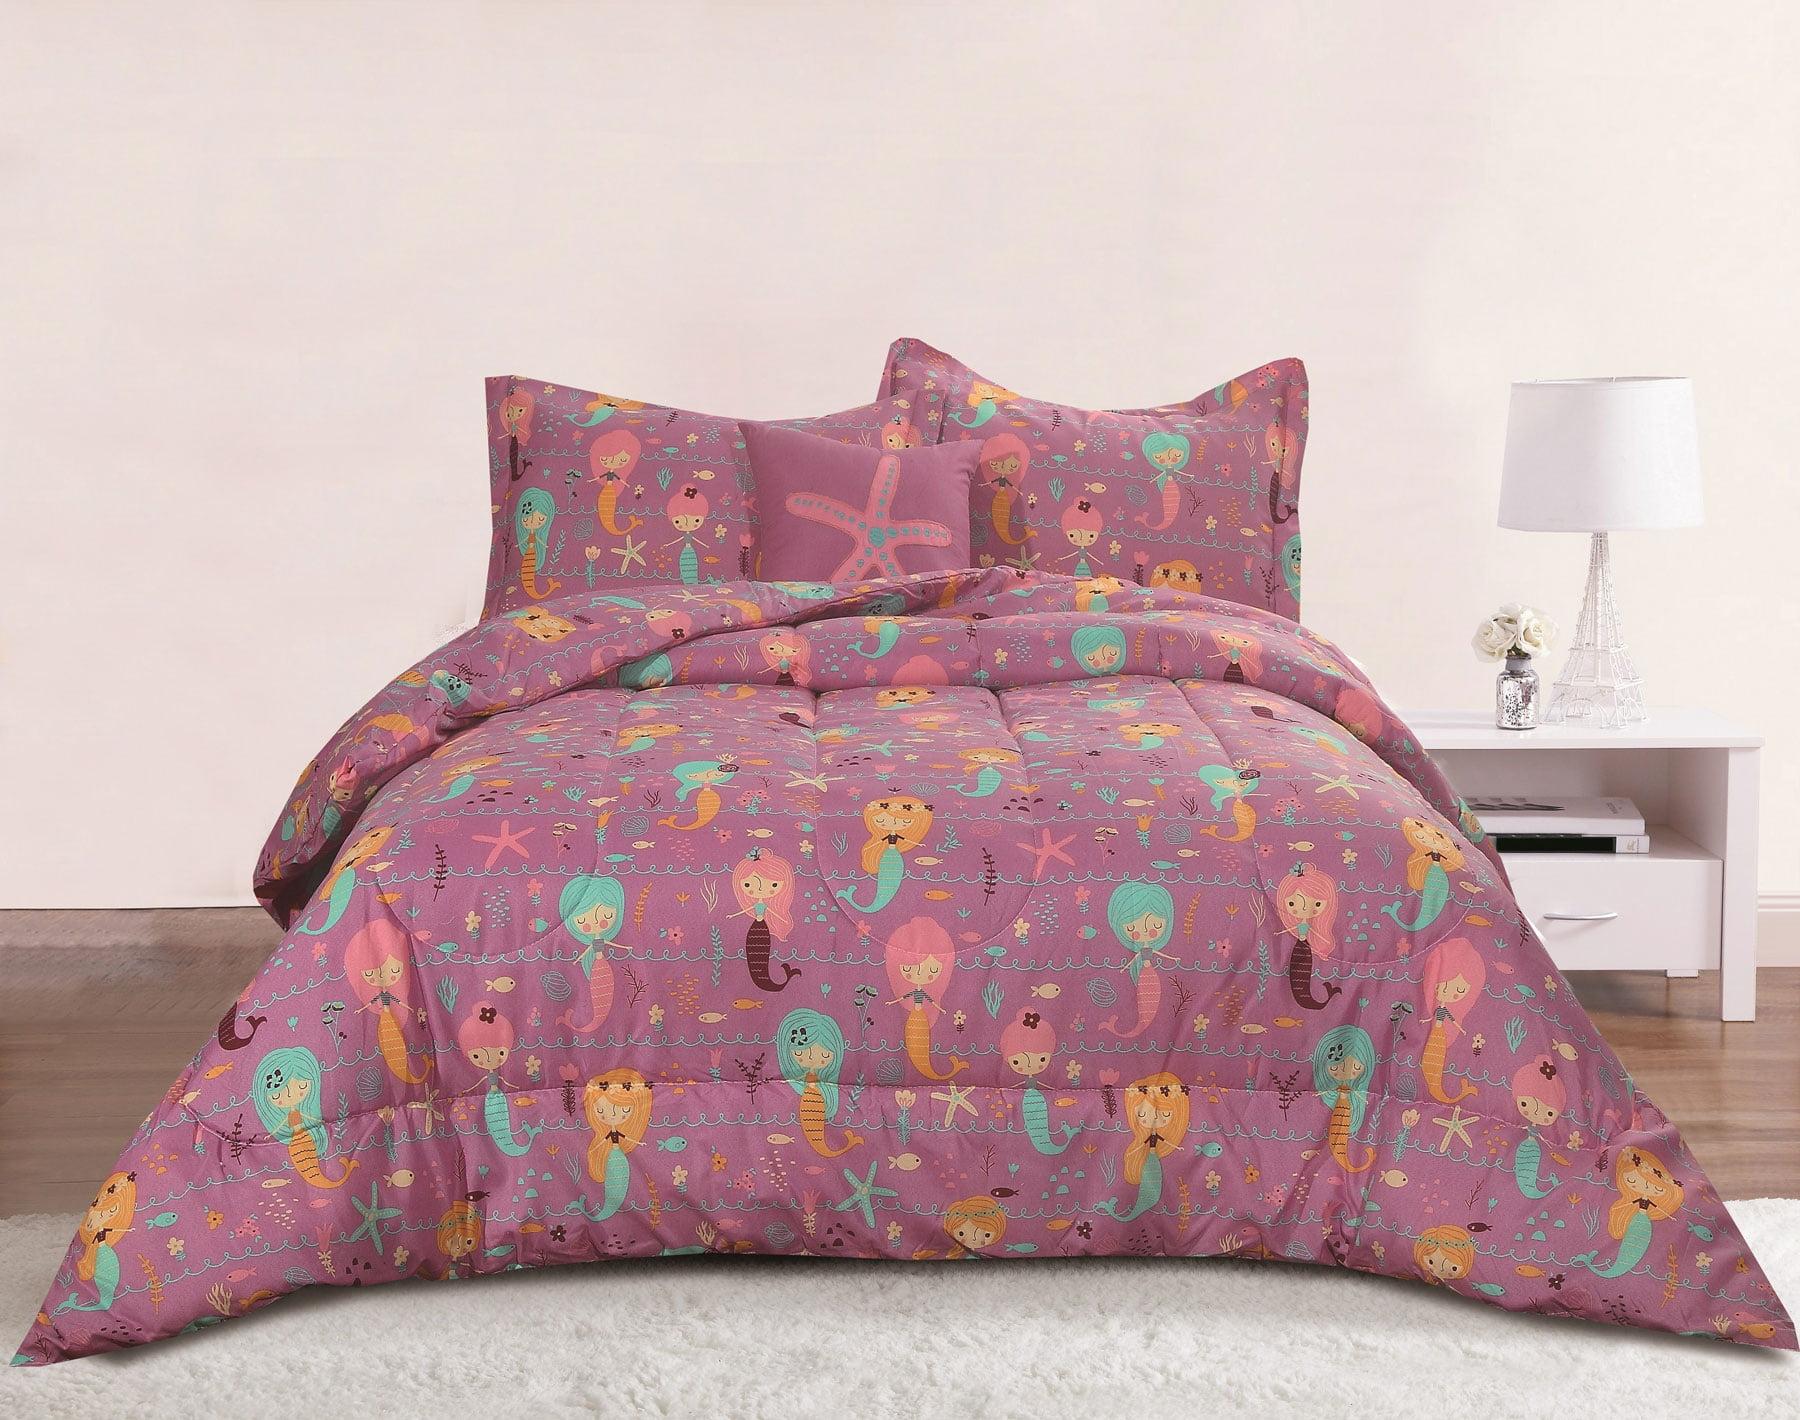 8ec97b06821b0a Mermaid Girls Bedding Twin 3 Piece Comforter Bed Set, Purple Pink ...